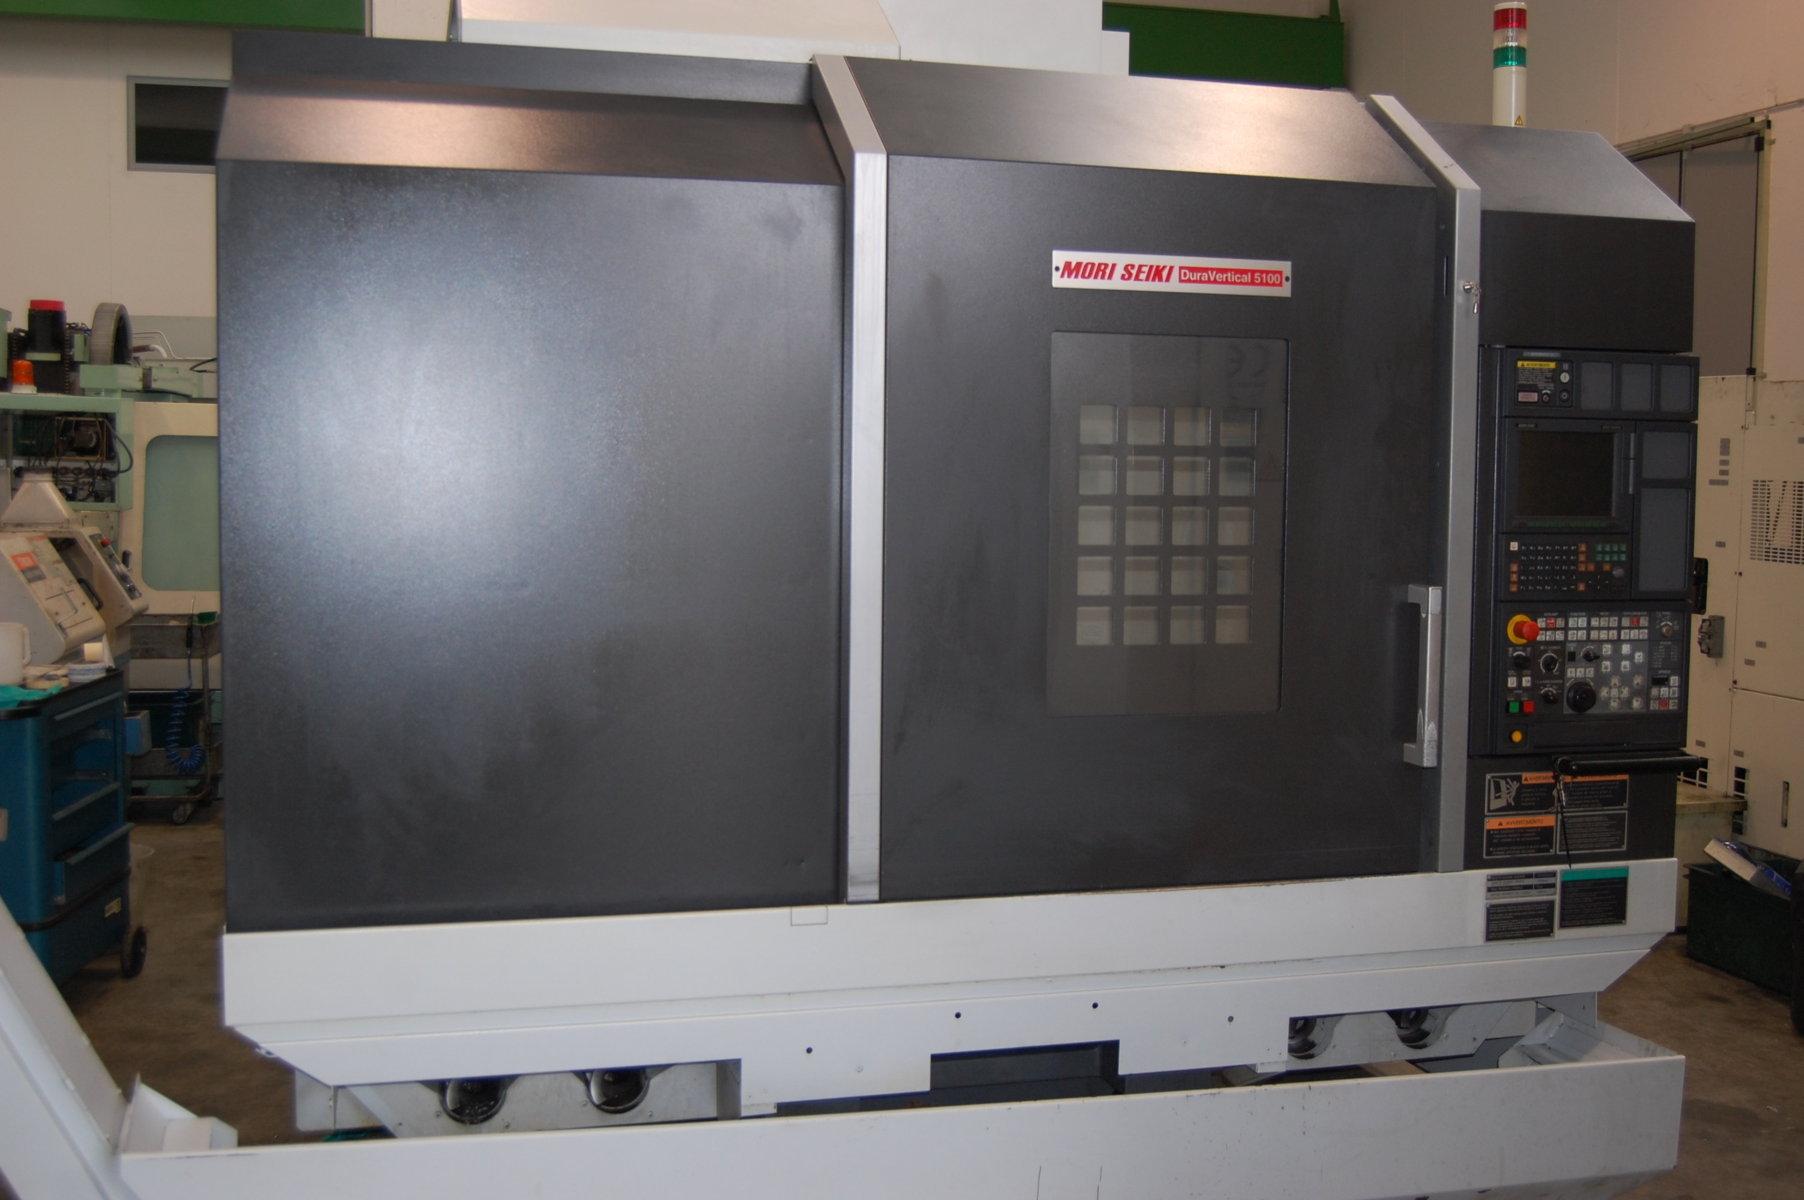 MORI SEIKI - DURAVERTICAL 5100